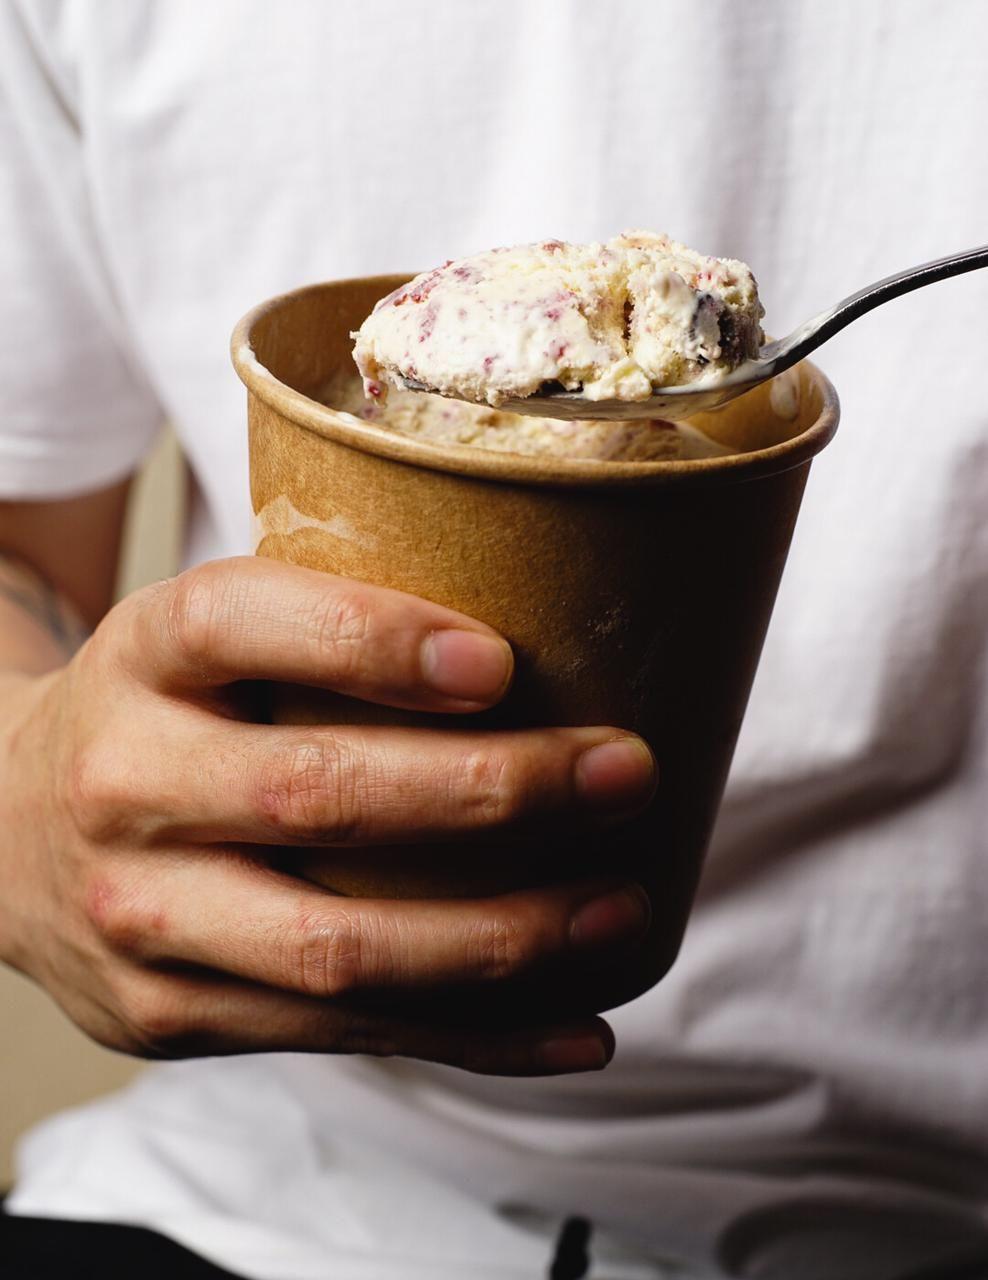 Where To Buy Ice Cream: Chef Josh Boutwood Is Now Making Gelato